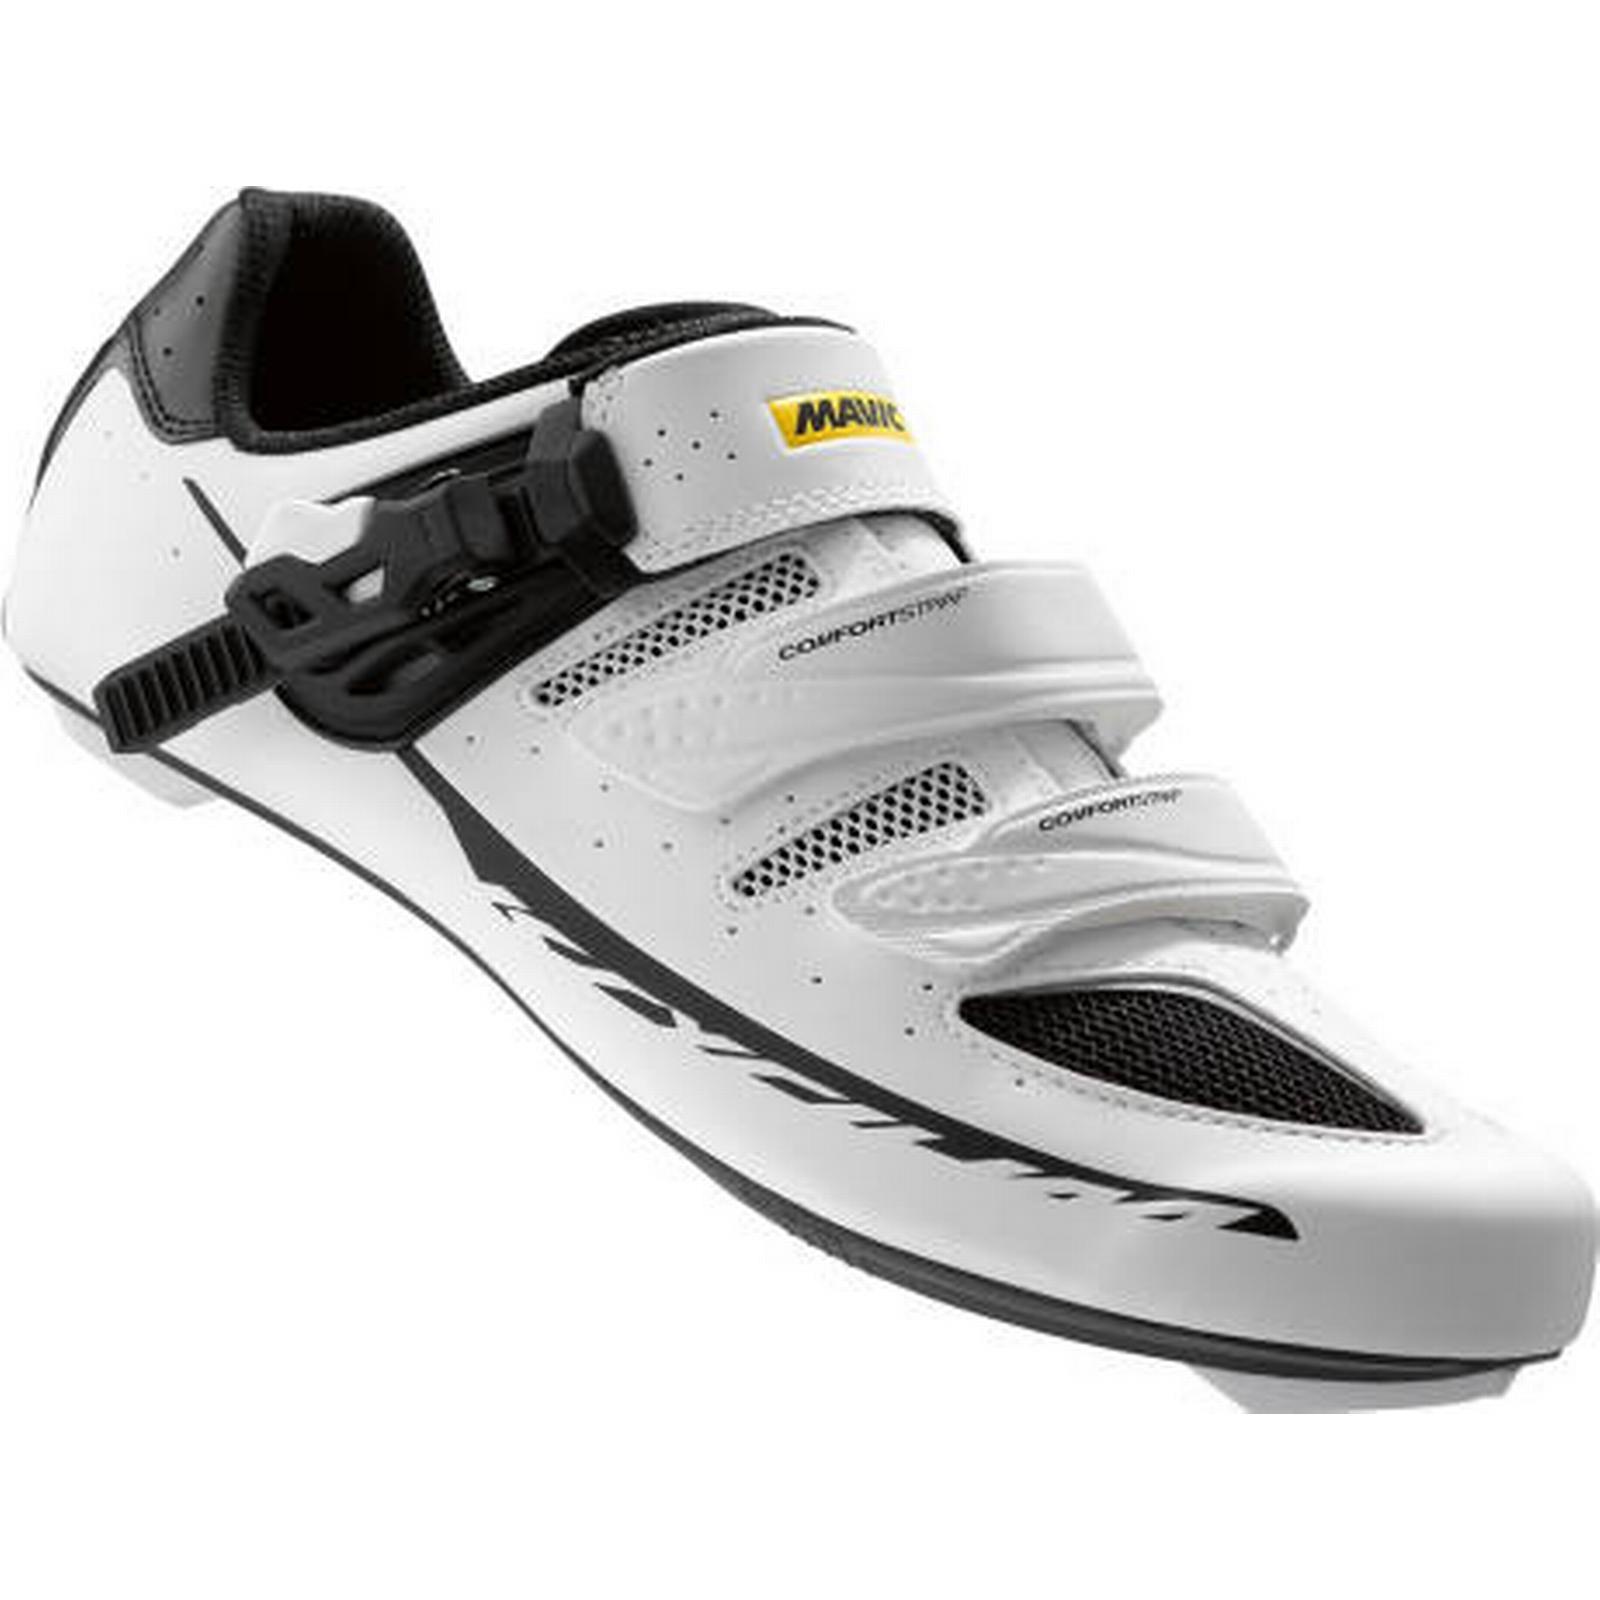 Mavic Shoes Mavic Ksyrium Elite II Road Cycling / Shoes 2016 - White / Cycling Black / EU48 2/3 355478